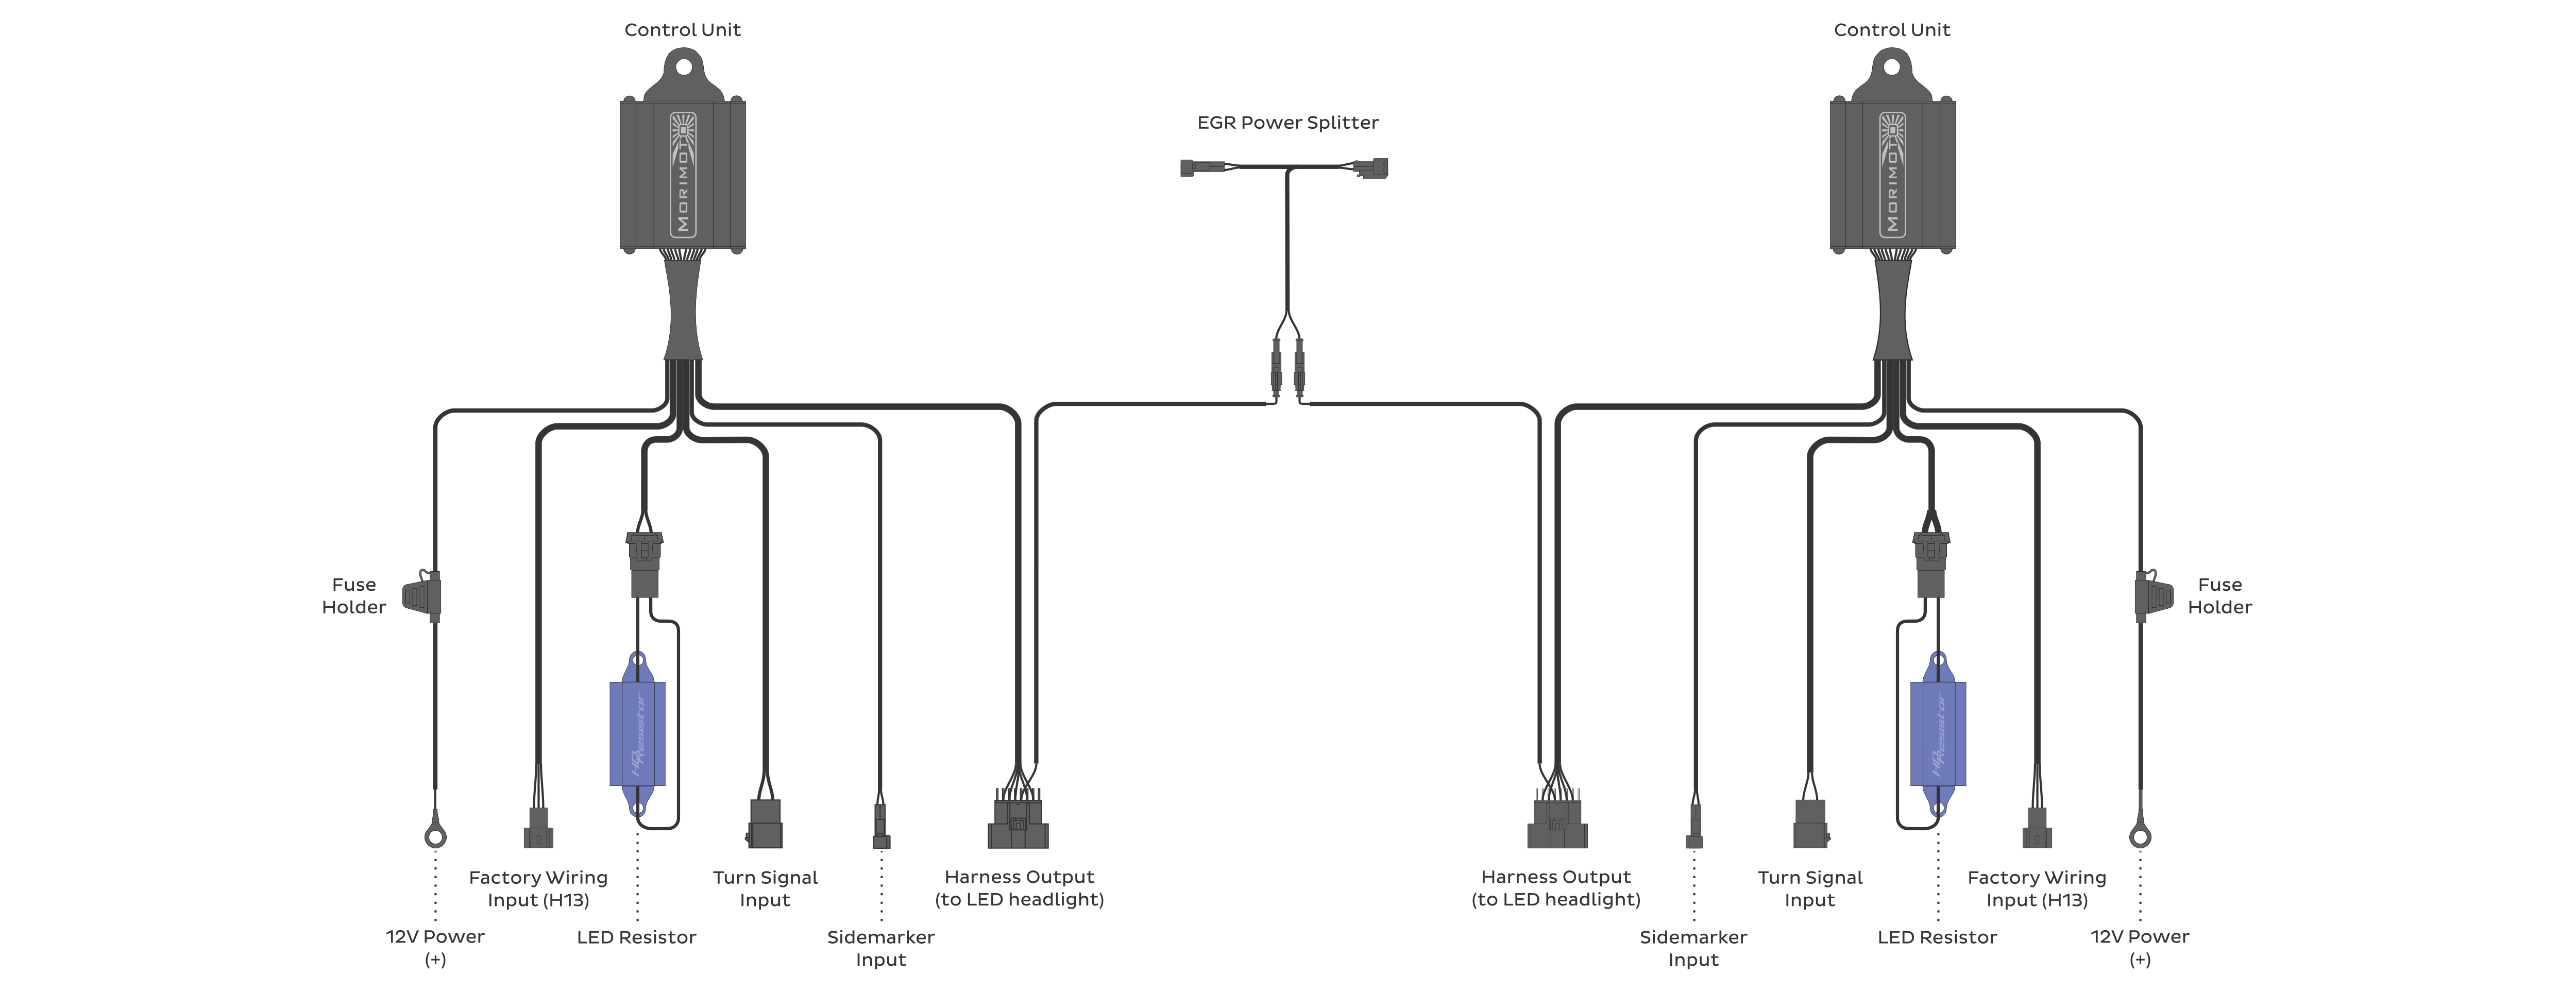 SUPERDUTY OEM LED CONVERSION (2017+) on h4 headlight wiring diagram, h11 headlight wiring diagram, c5 headlight wiring diagram, g8 headlight wiring diagram,